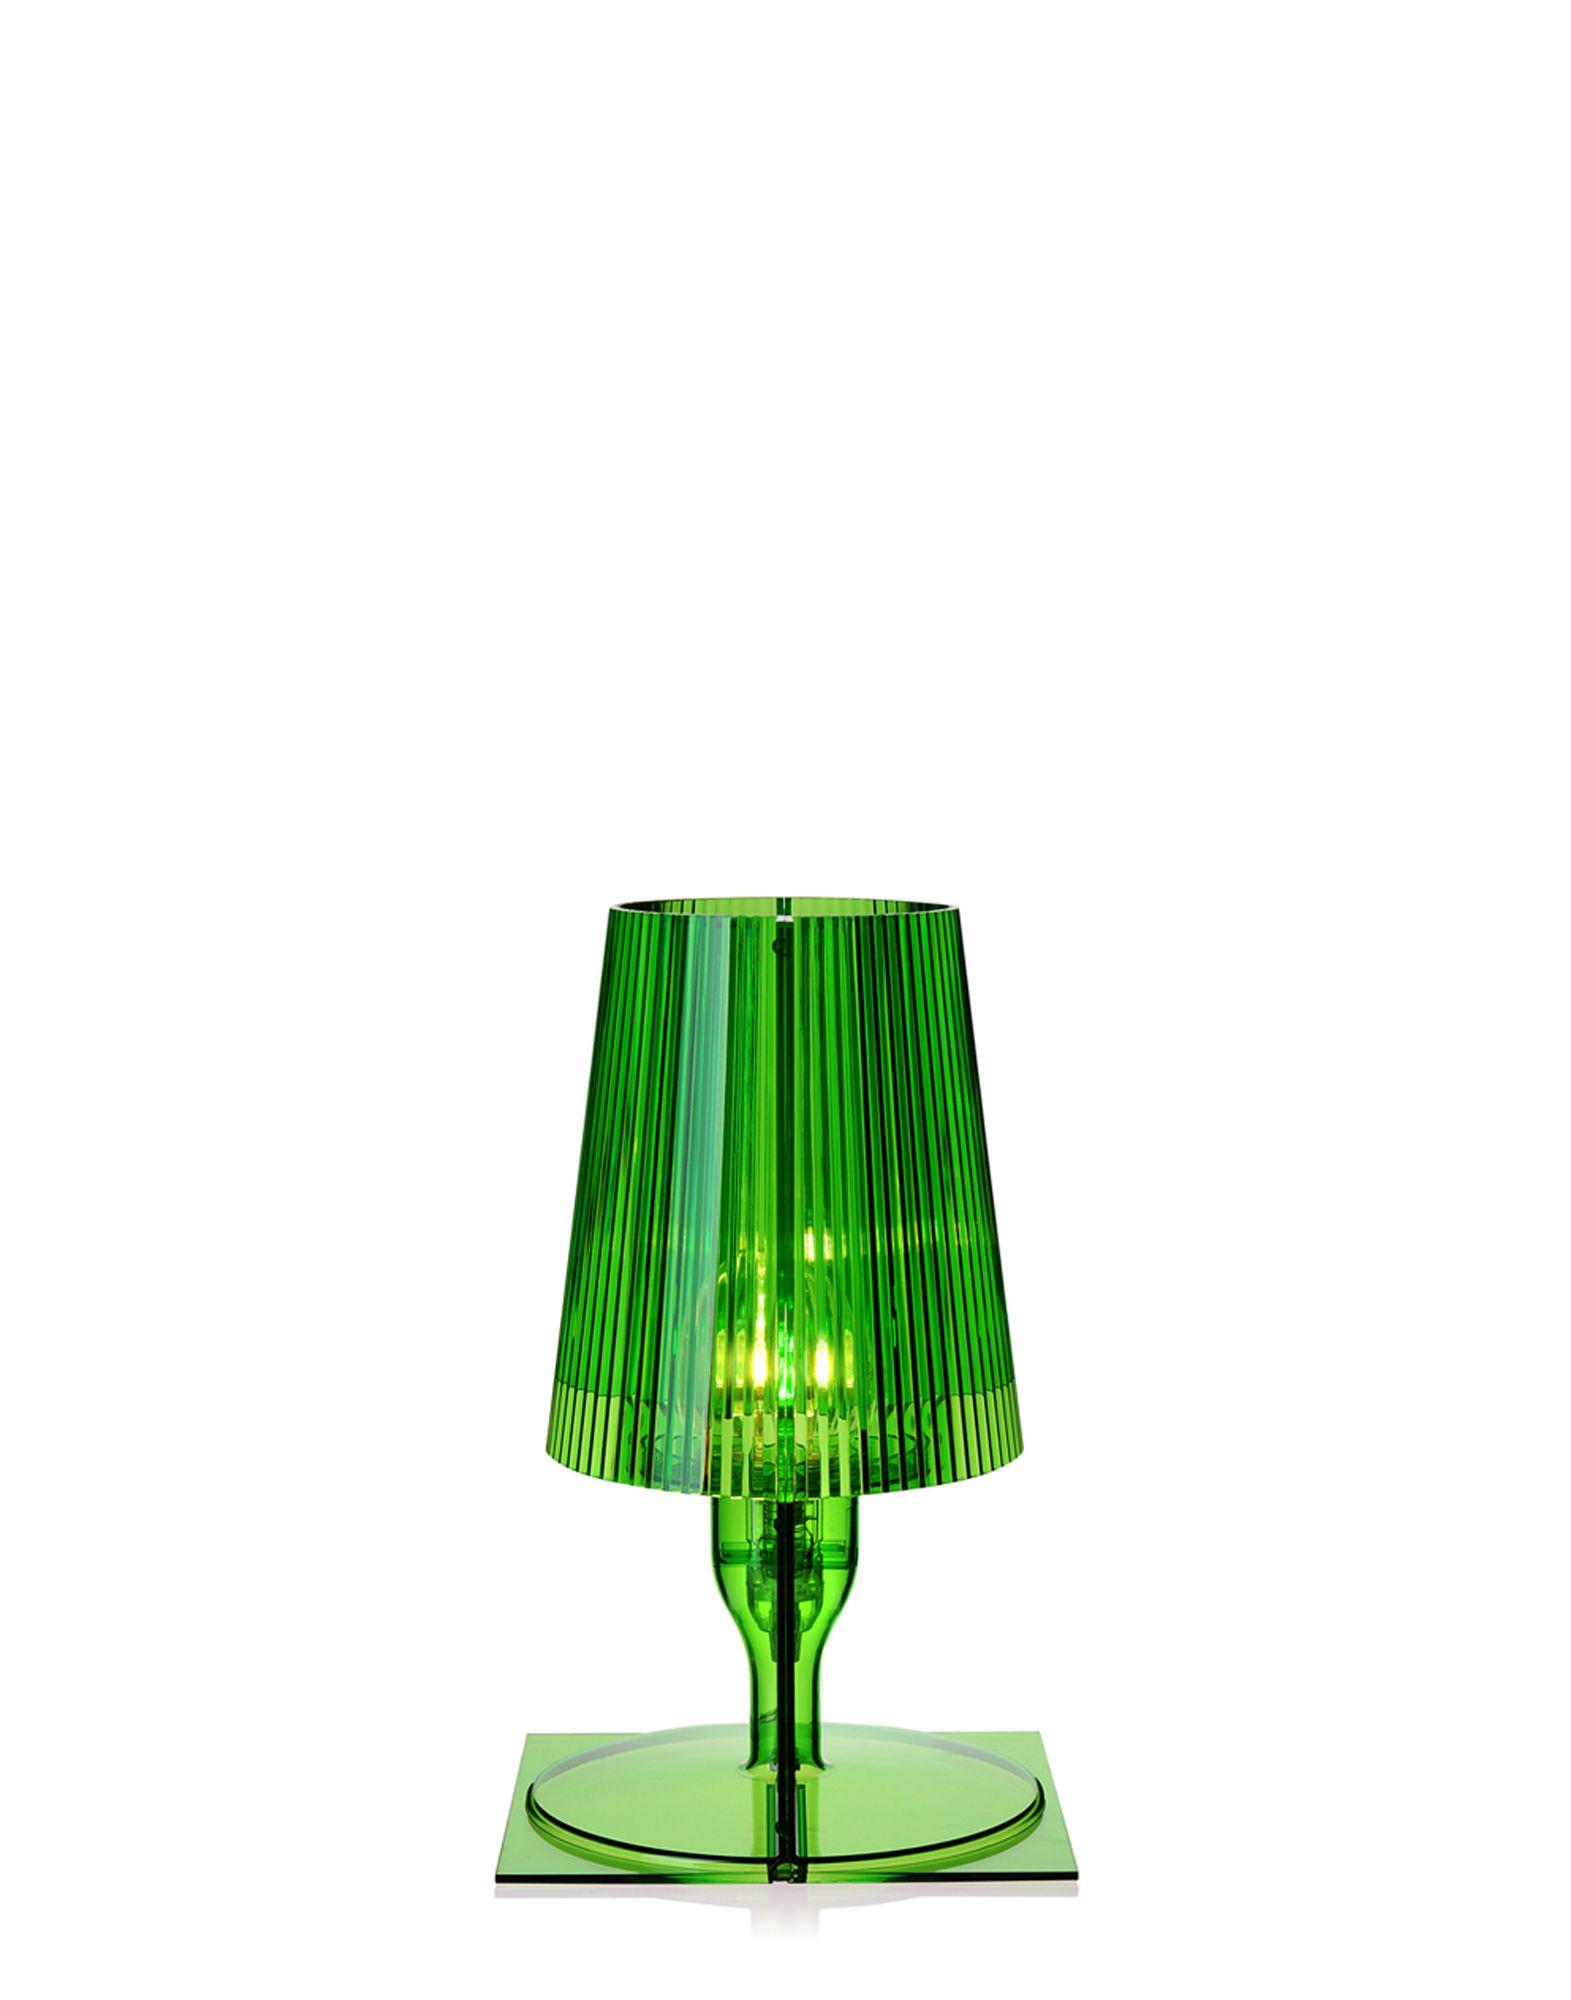 Kartell lampada da tavolo Take verde, Newformsdesign | lampade da ...